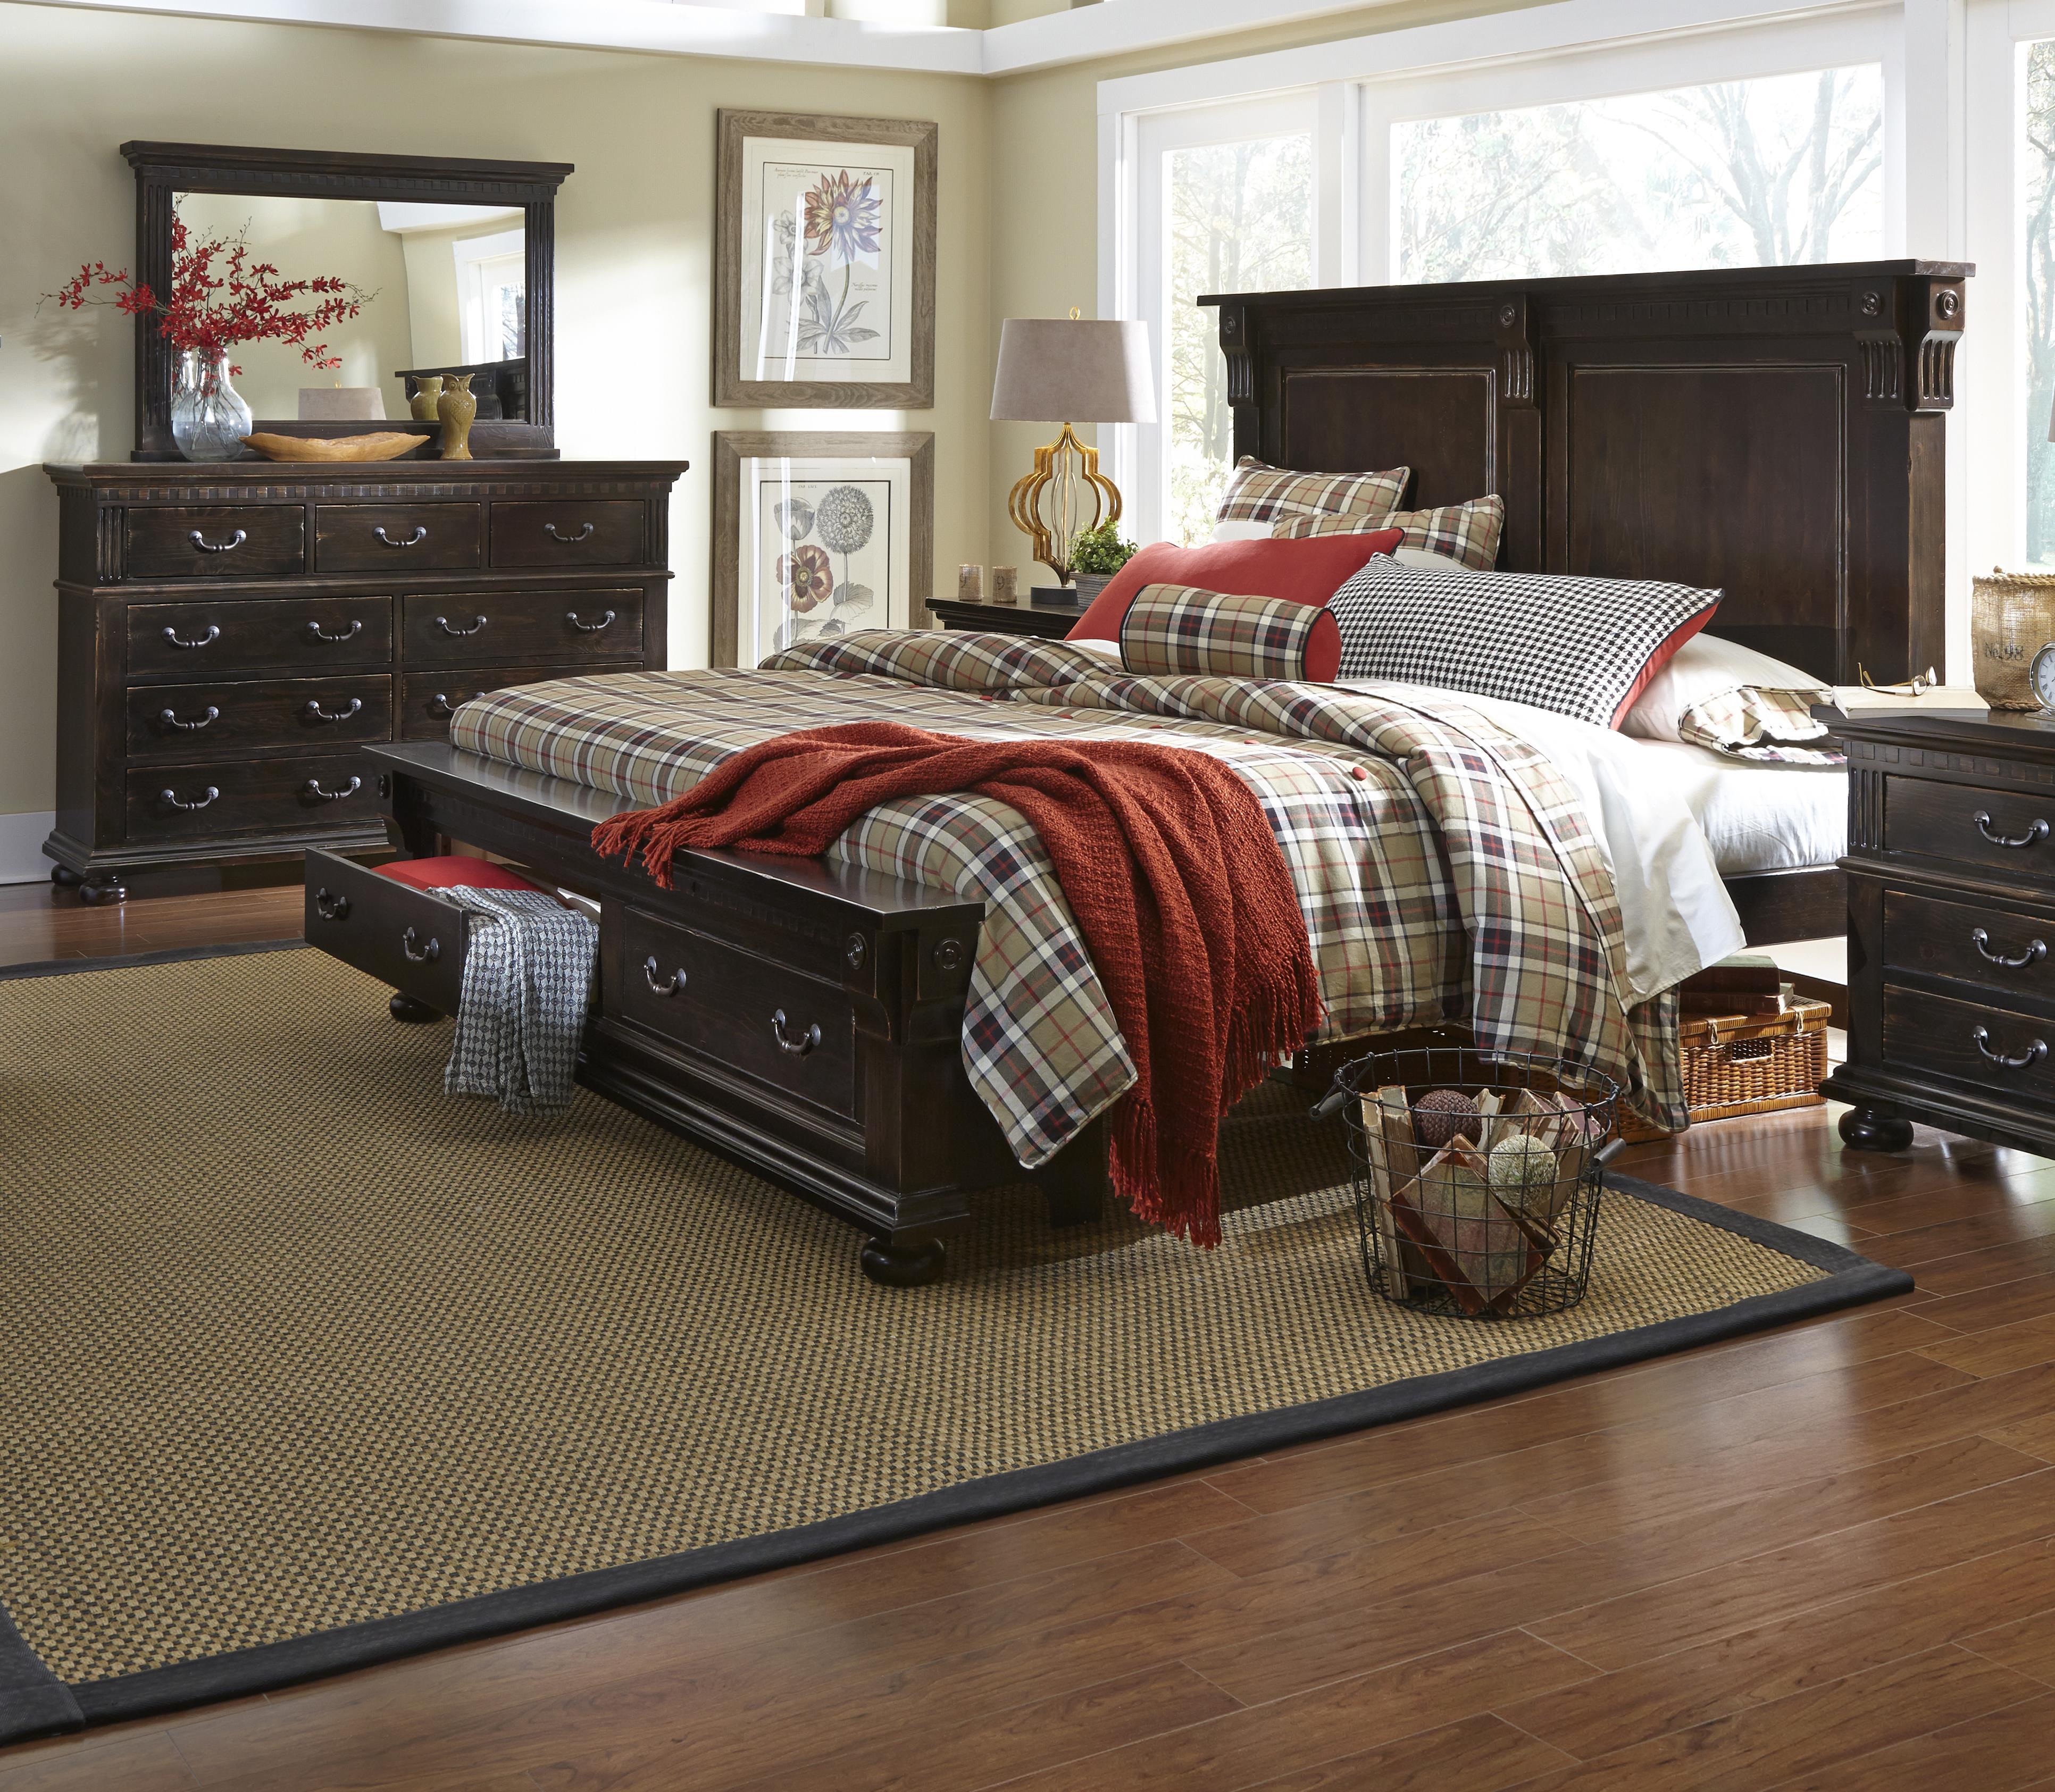 Progressive Furniture La Cantera Queen Bedroom Group - Item Number: P665 Q Bedroom Group 2